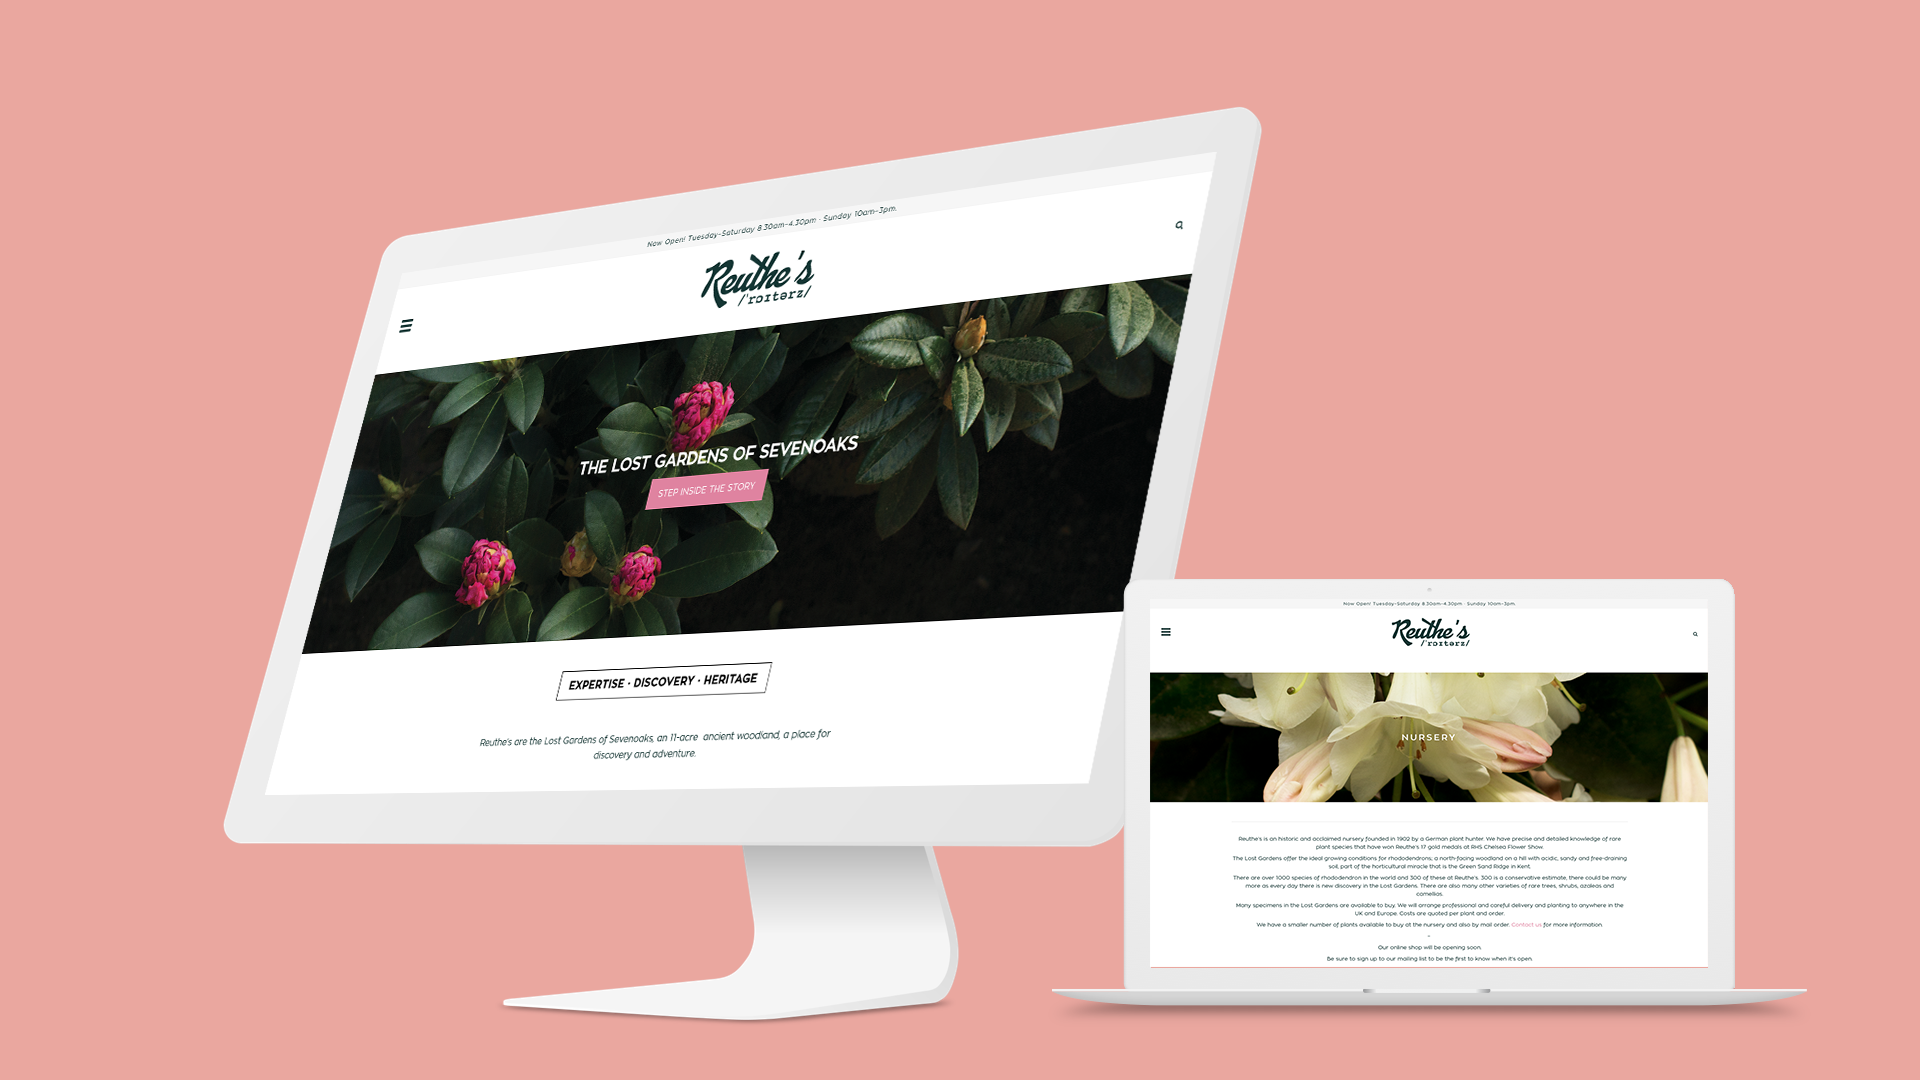 reuthes-lost-gardens-of-sevenoaks-bgsd-website-project.jpg